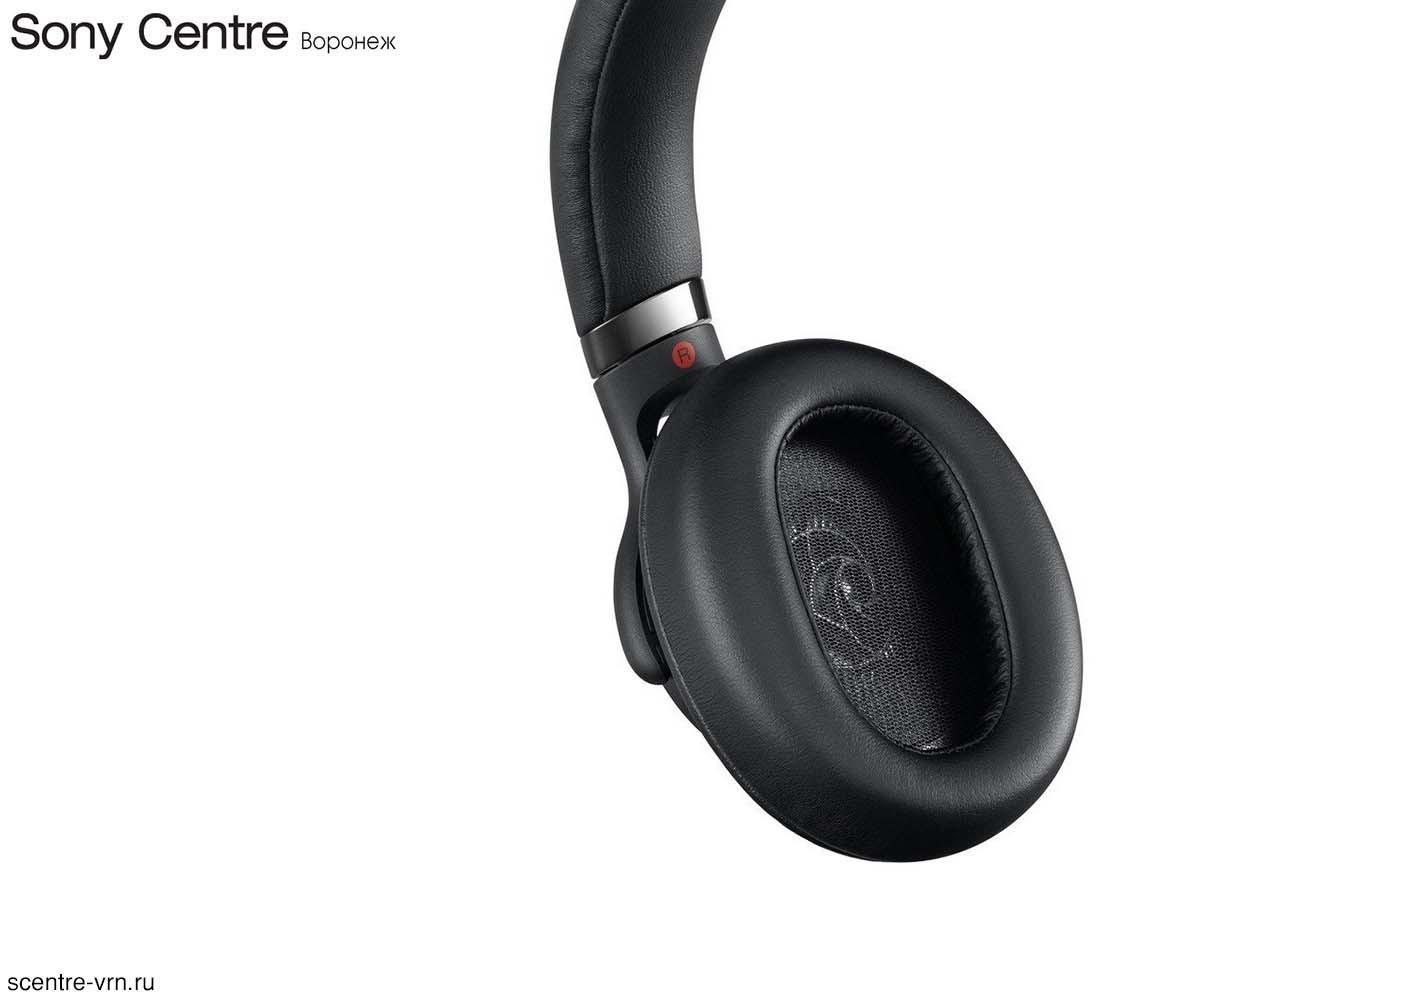 Наушники Sony MDR-1AM2B чёрного цвета